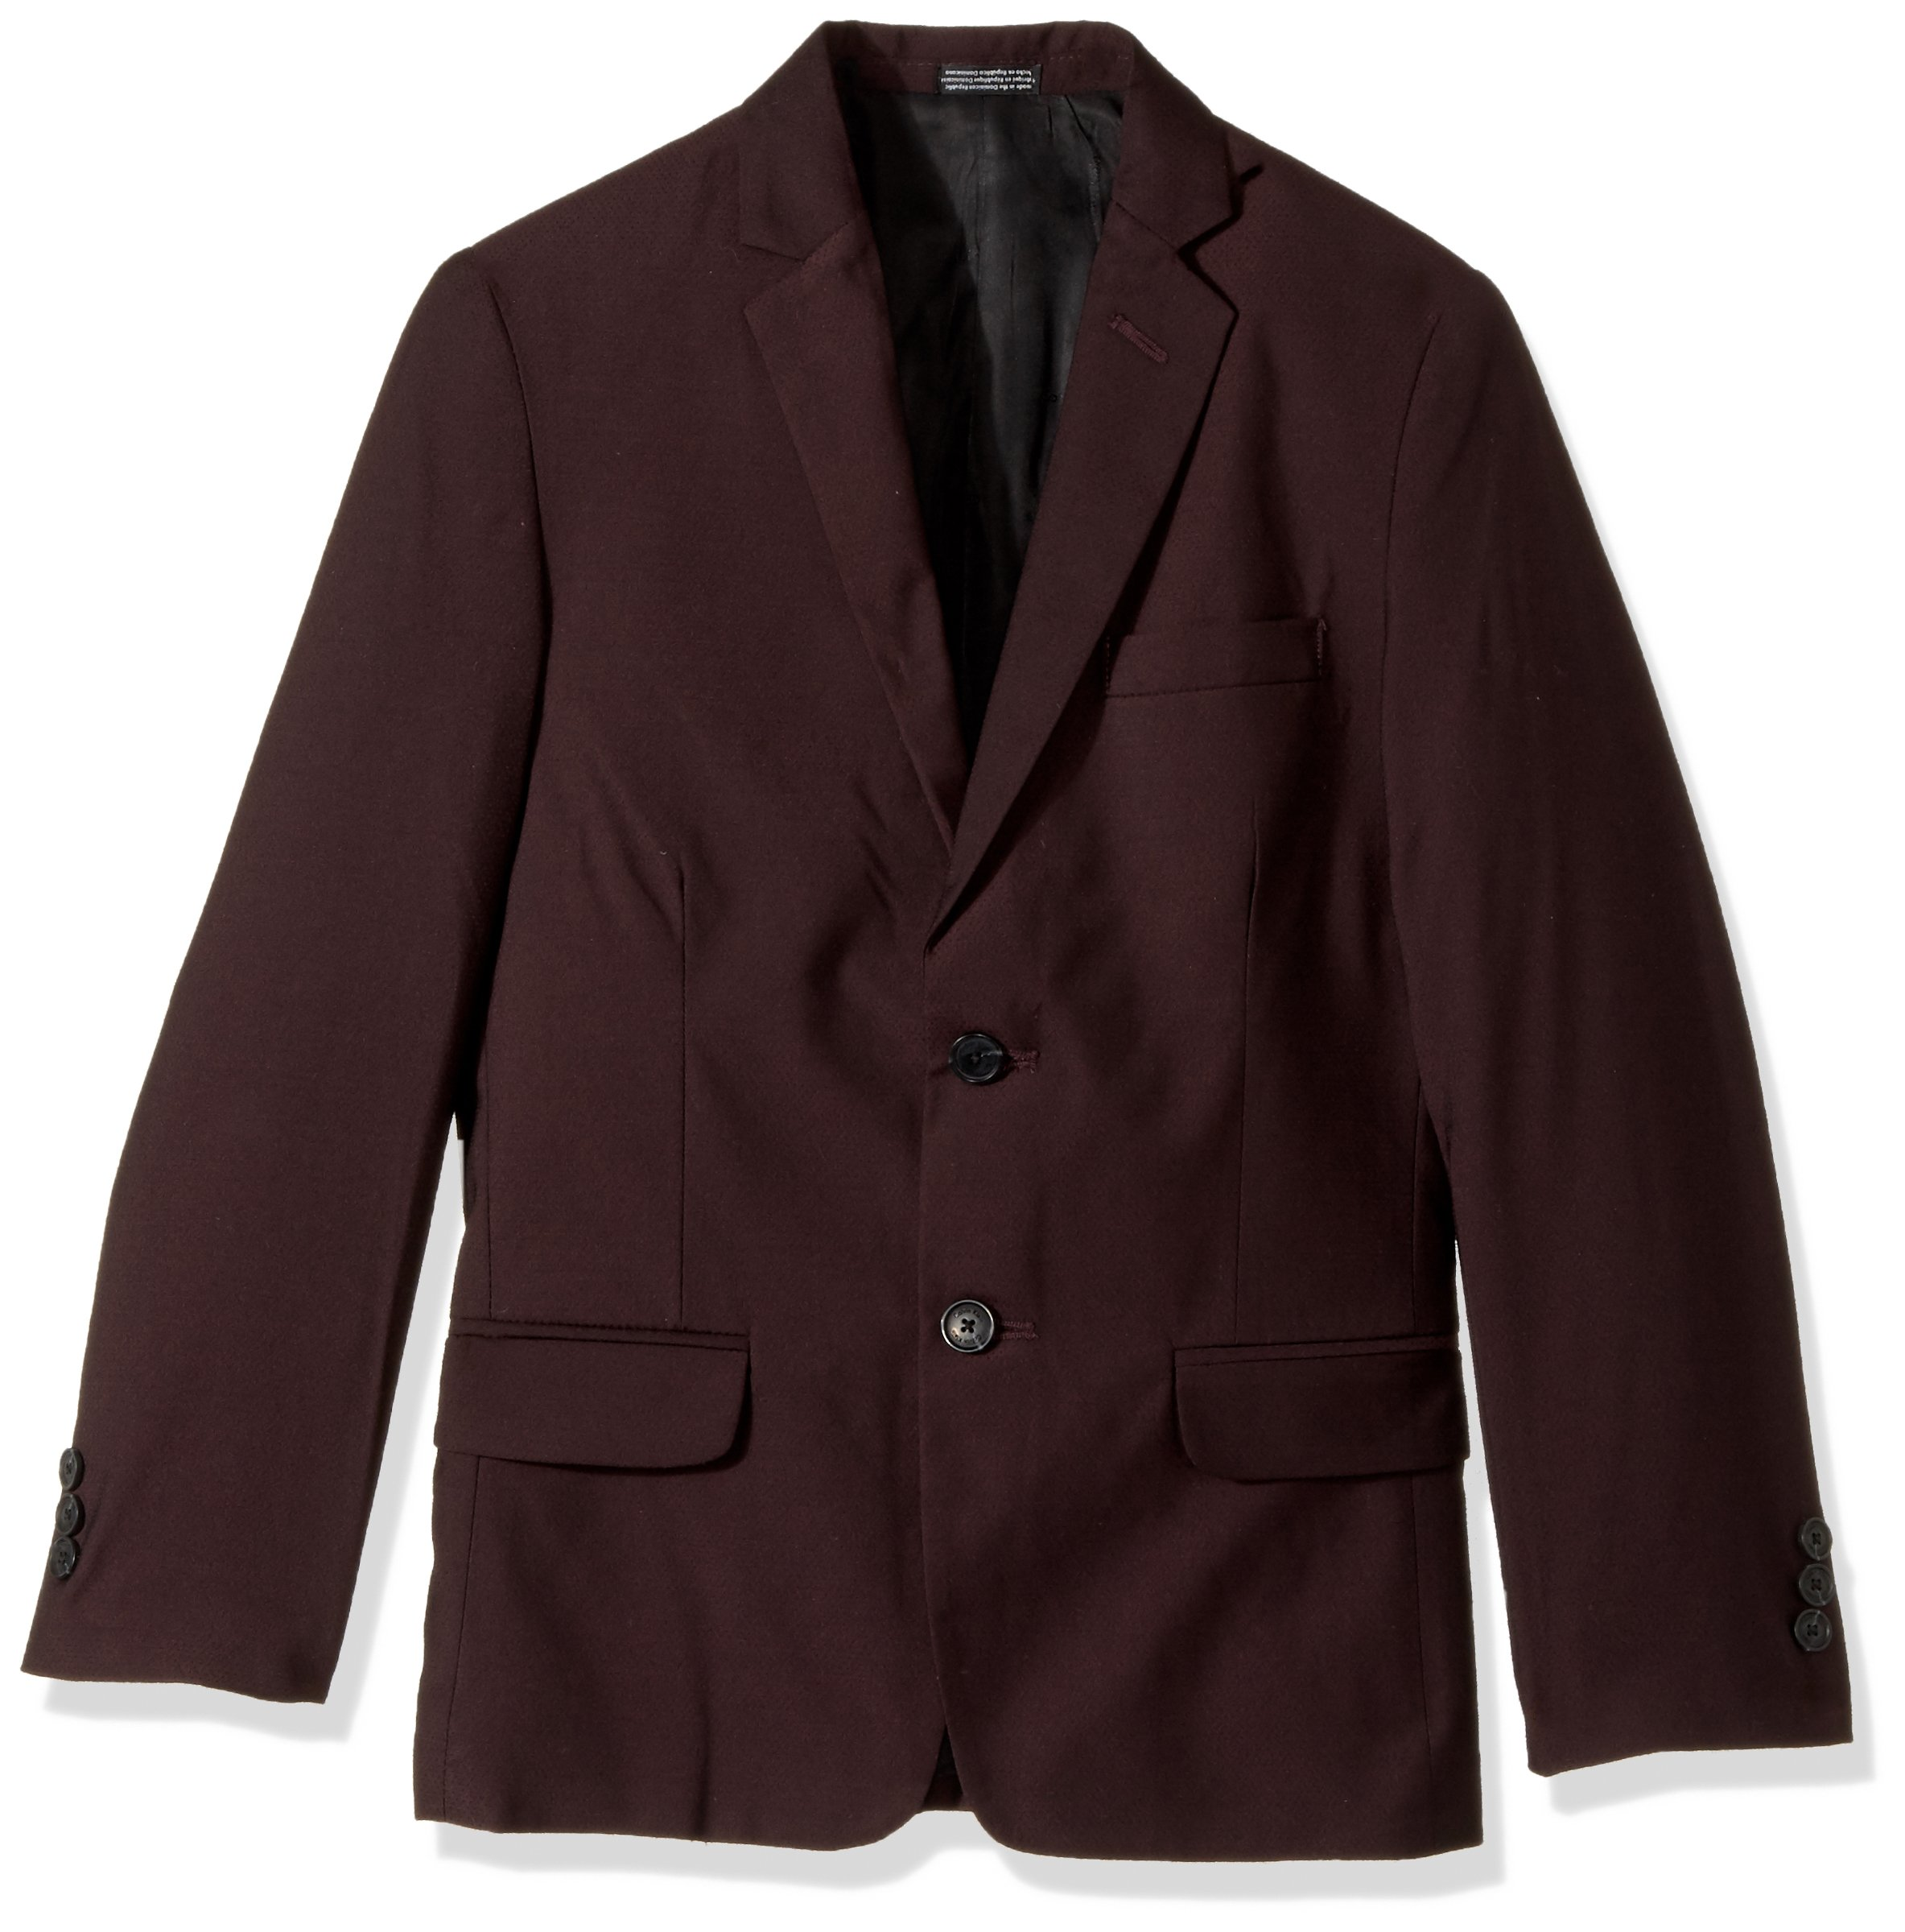 Calvin Klein Big Boys' Blazer Jacket, Square Burgundy, 20